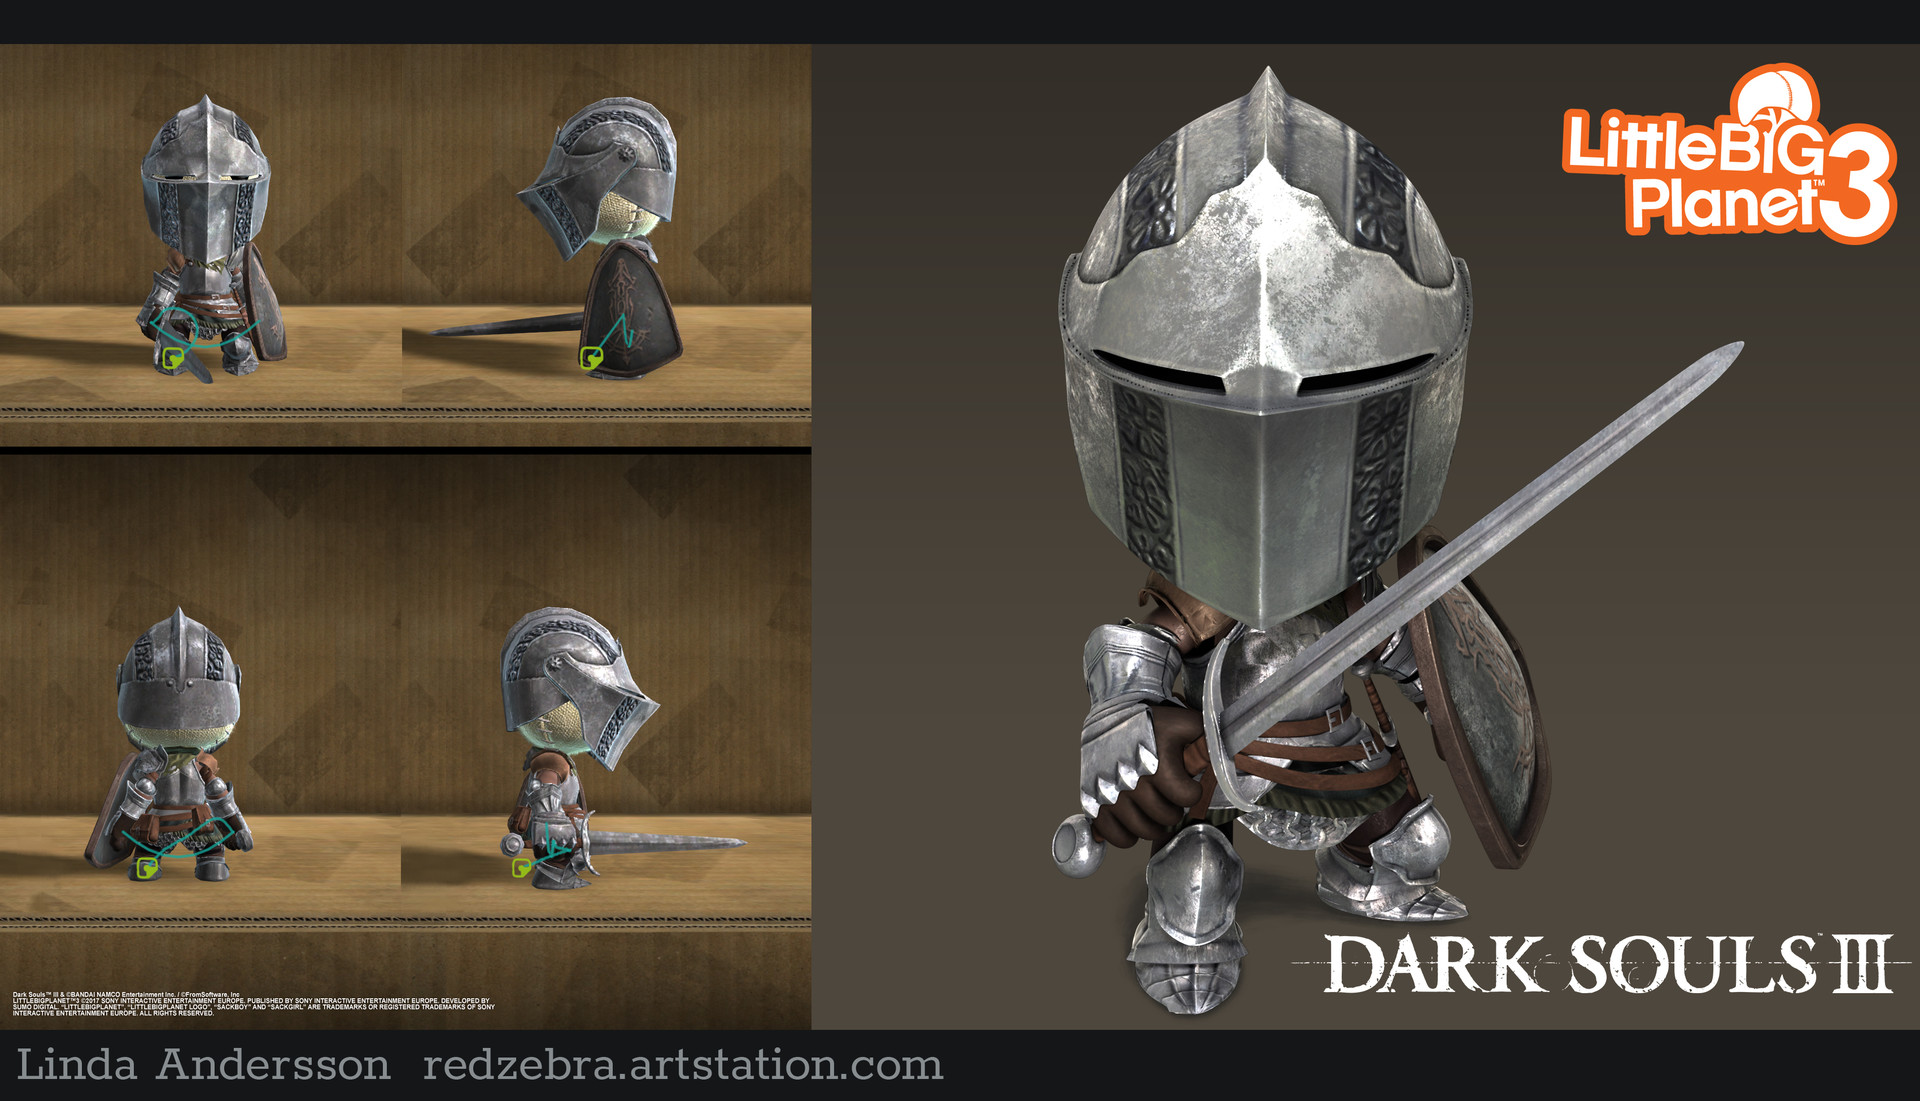 ArtStation - Dark Souls 3 DLC Costumes, Linda Andersson